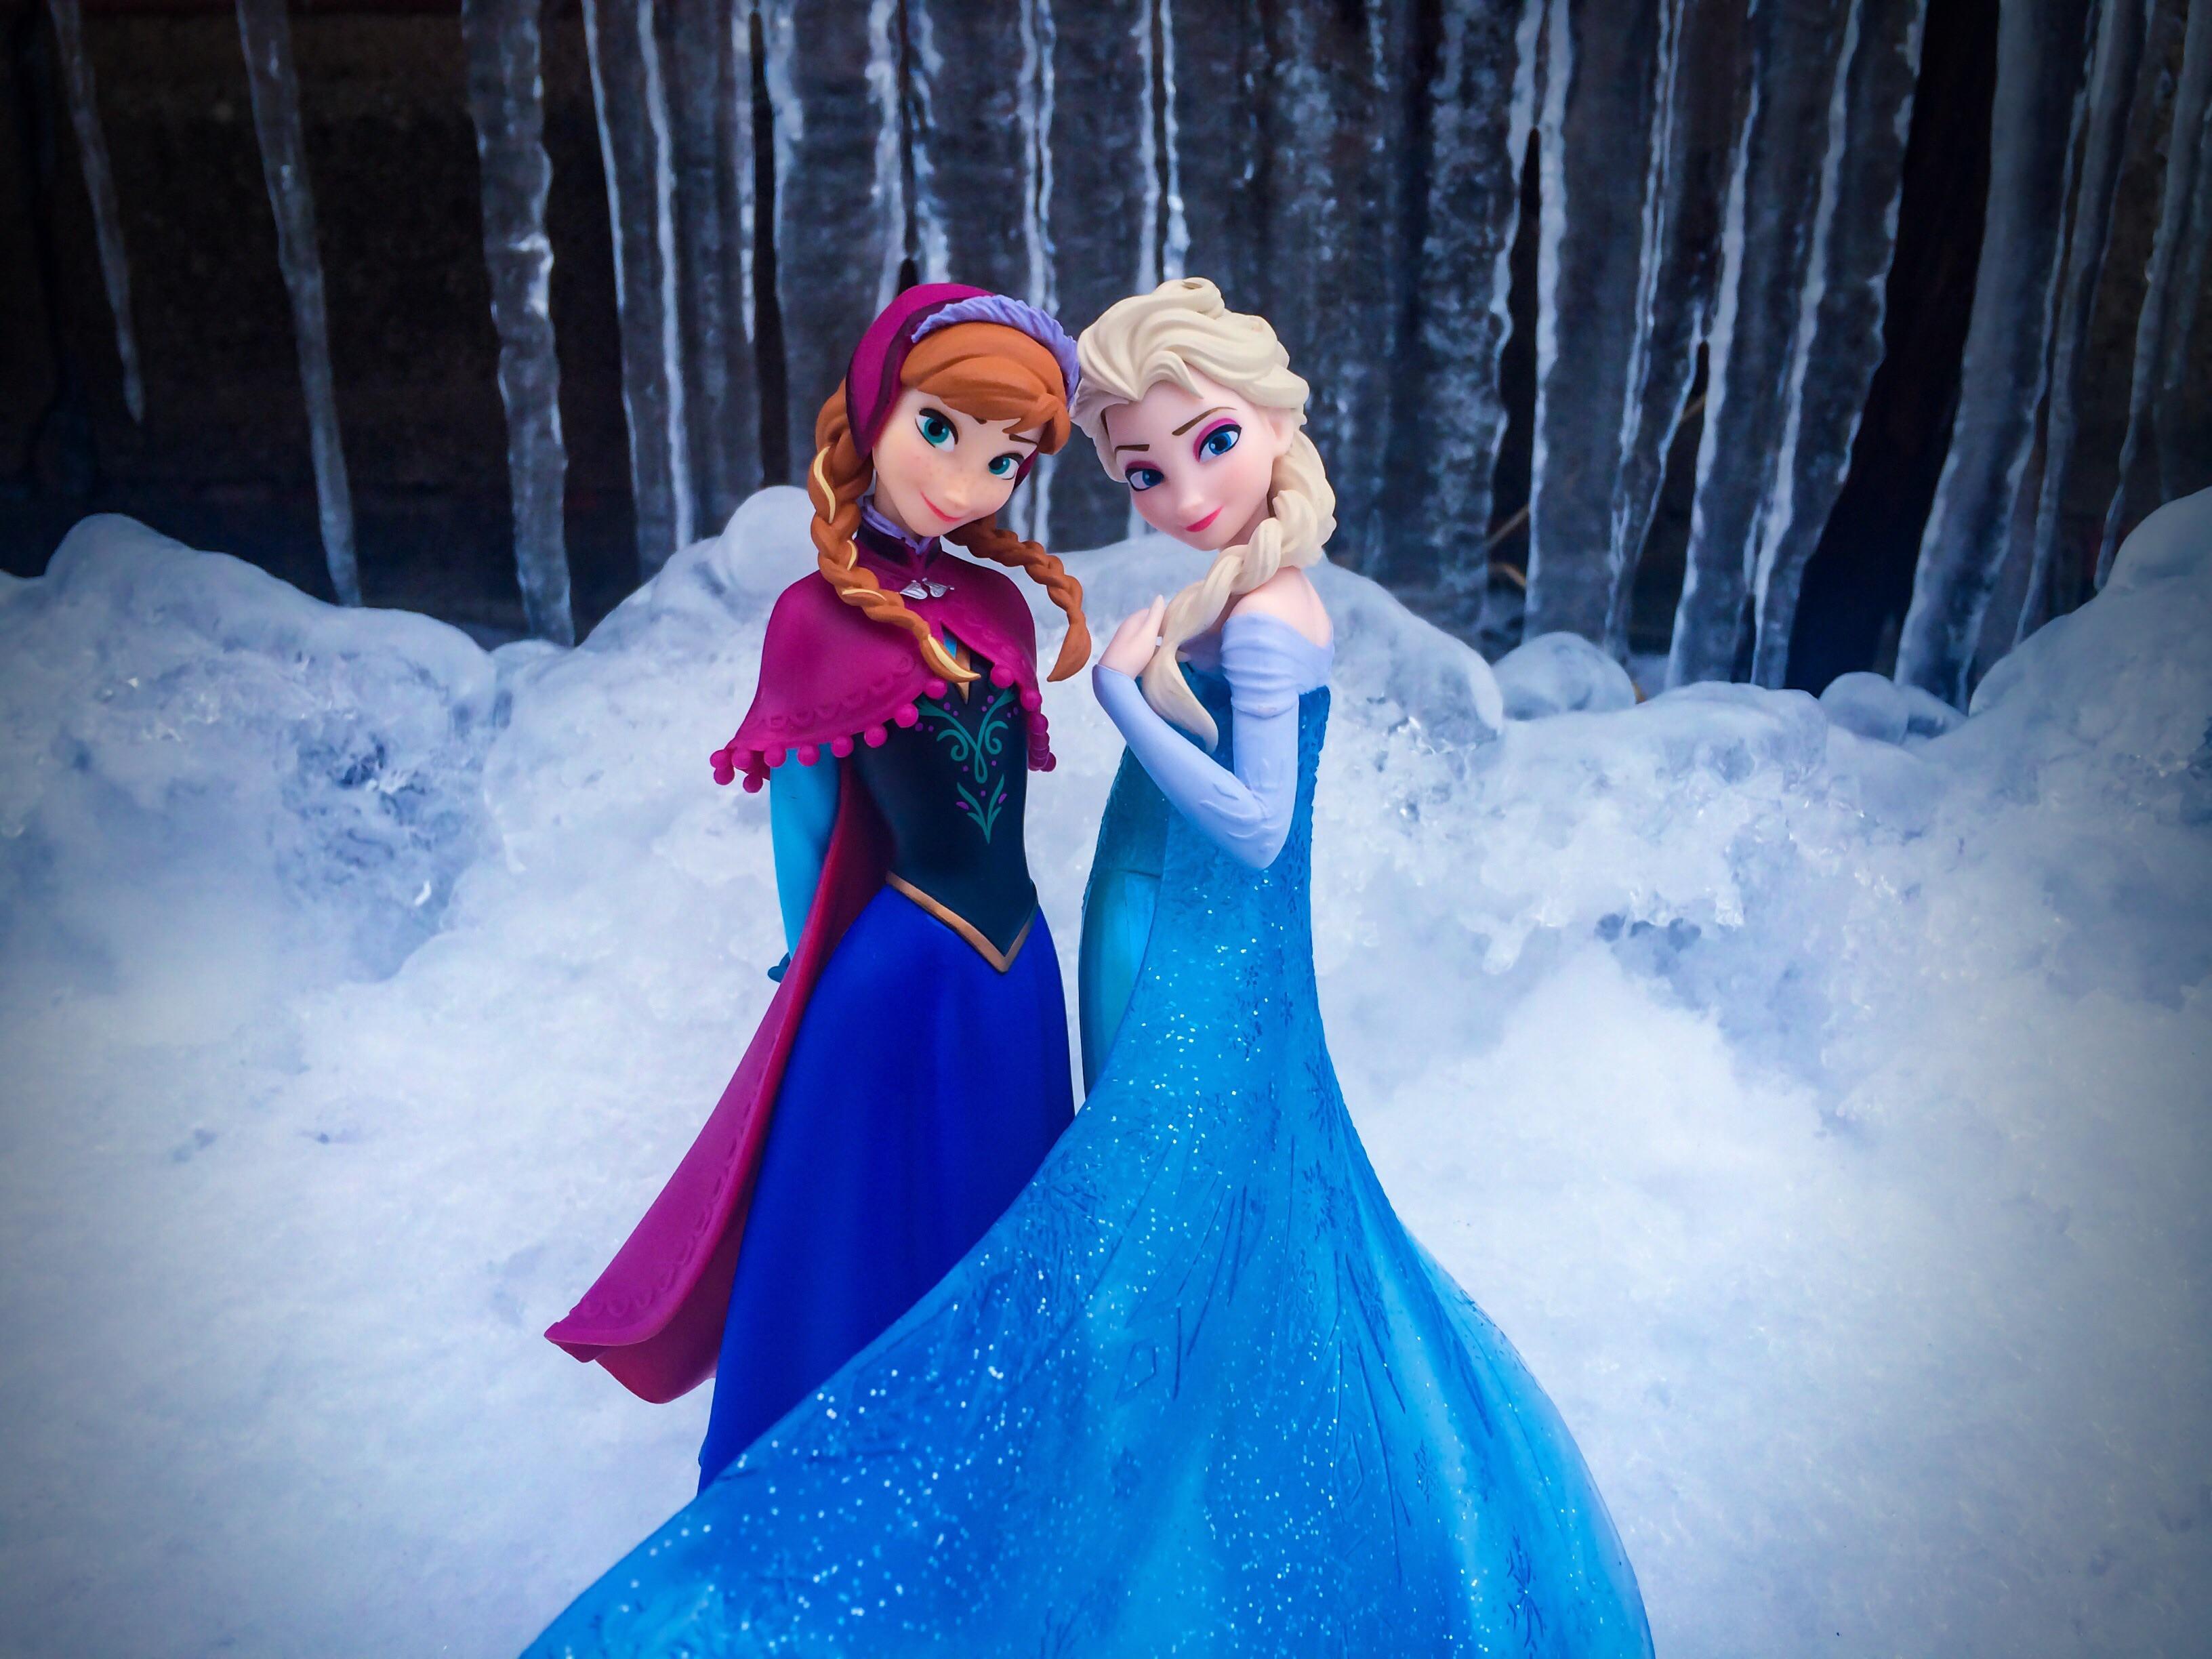 sega anna frozen pm_figure the_walt_disney_company elsa sega_disney_prize